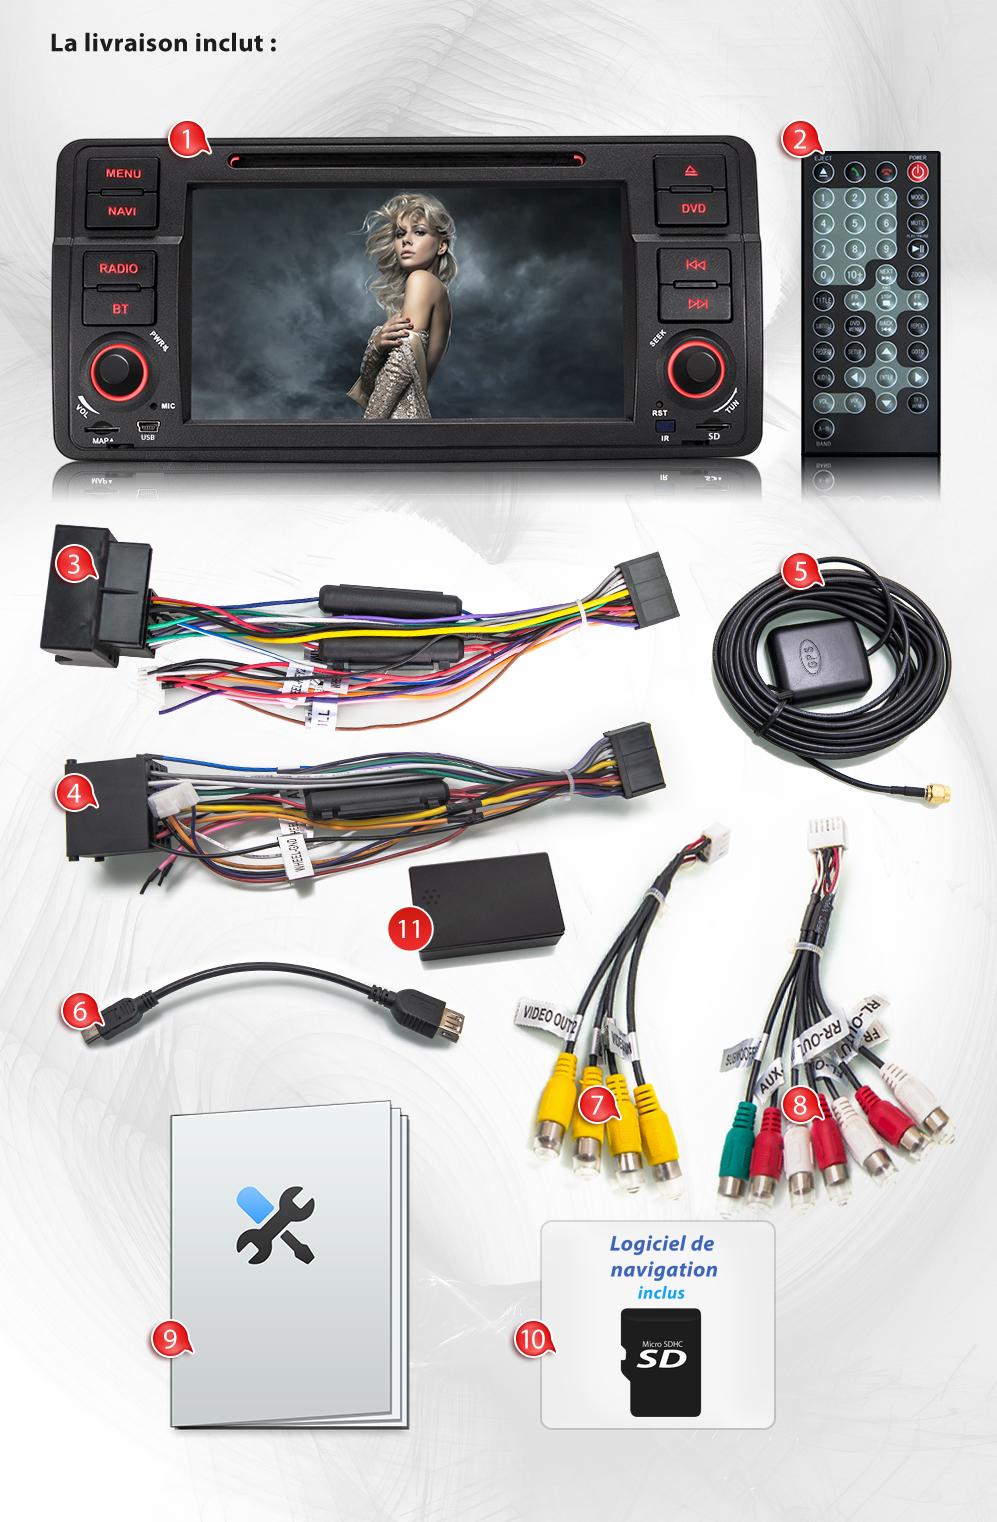 autoradio bmw e46 serie 3 gps bluetooth cran tactile dvd cd usb sd mp3 1din ebay. Black Bedroom Furniture Sets. Home Design Ideas